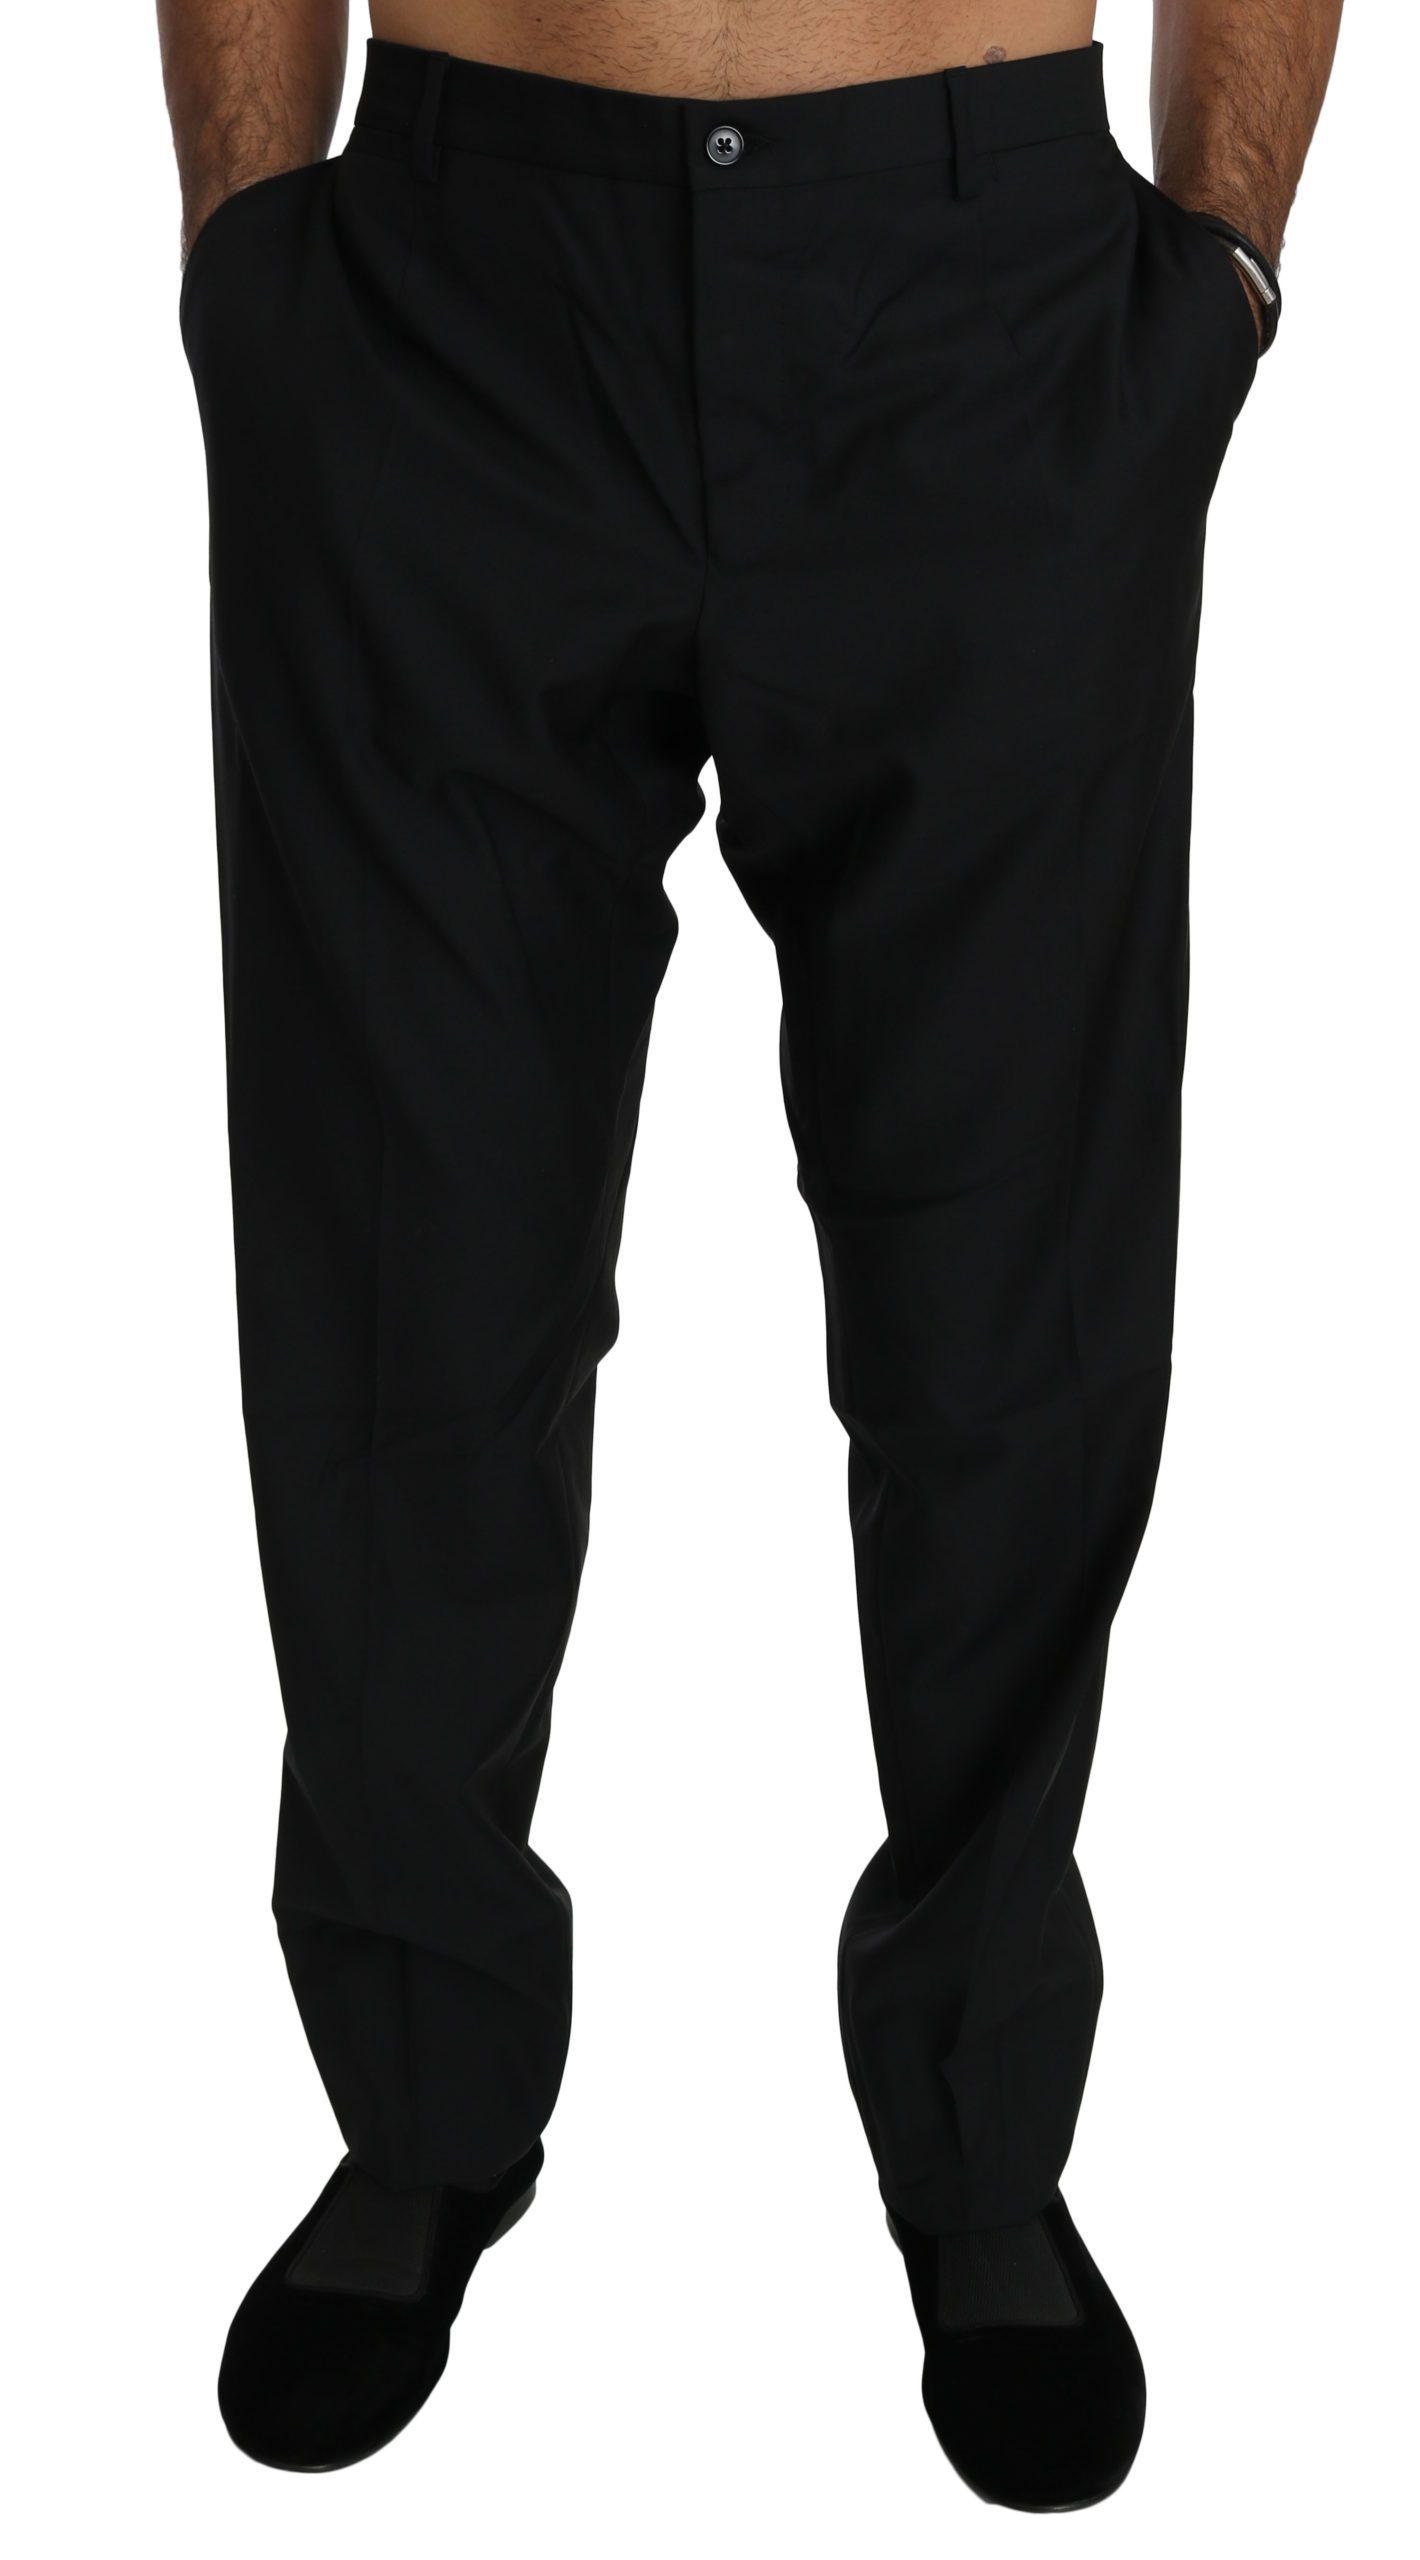 Dolce & Gabbana Men's Formal Wool Trouser Black PAN70766 - IT56 | XXL